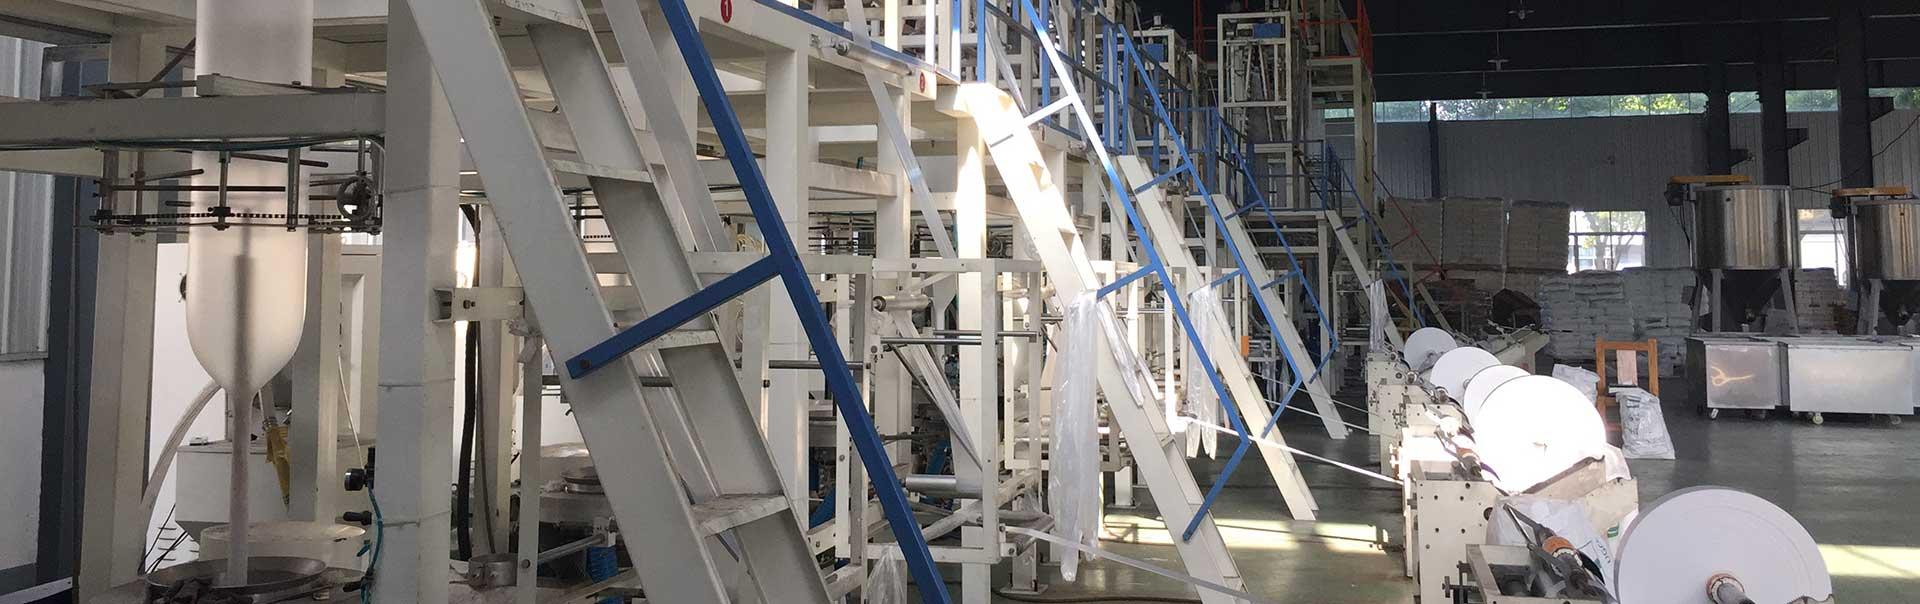 bage bg - Bags factory